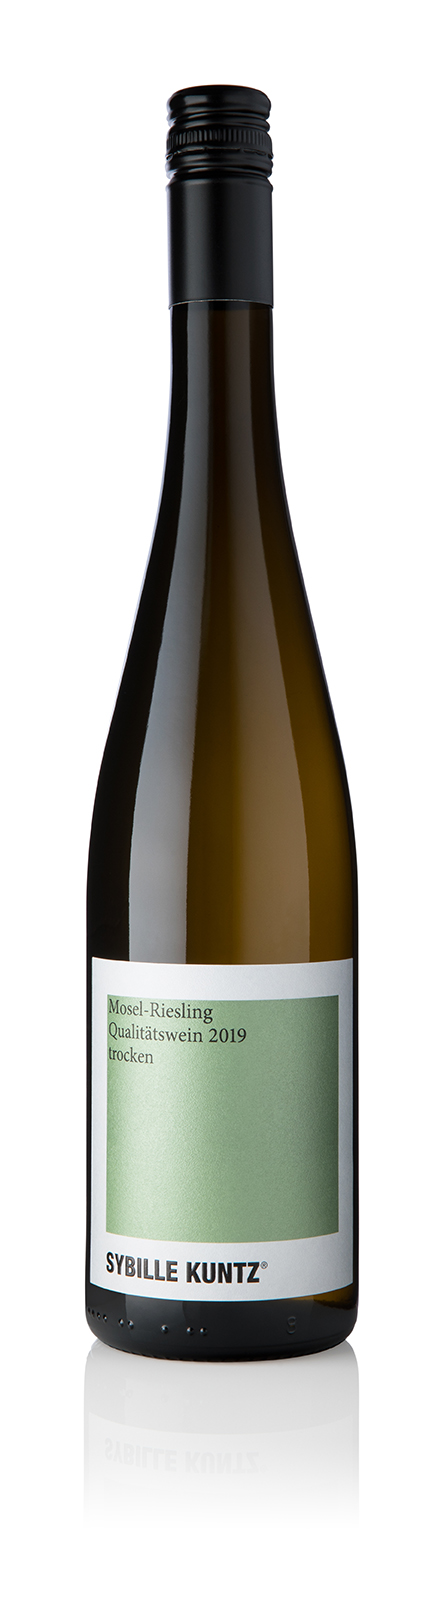 2019 SYBILLE KUNTZ Mosel-Riesling Qualitätswein trocken 0,75 l